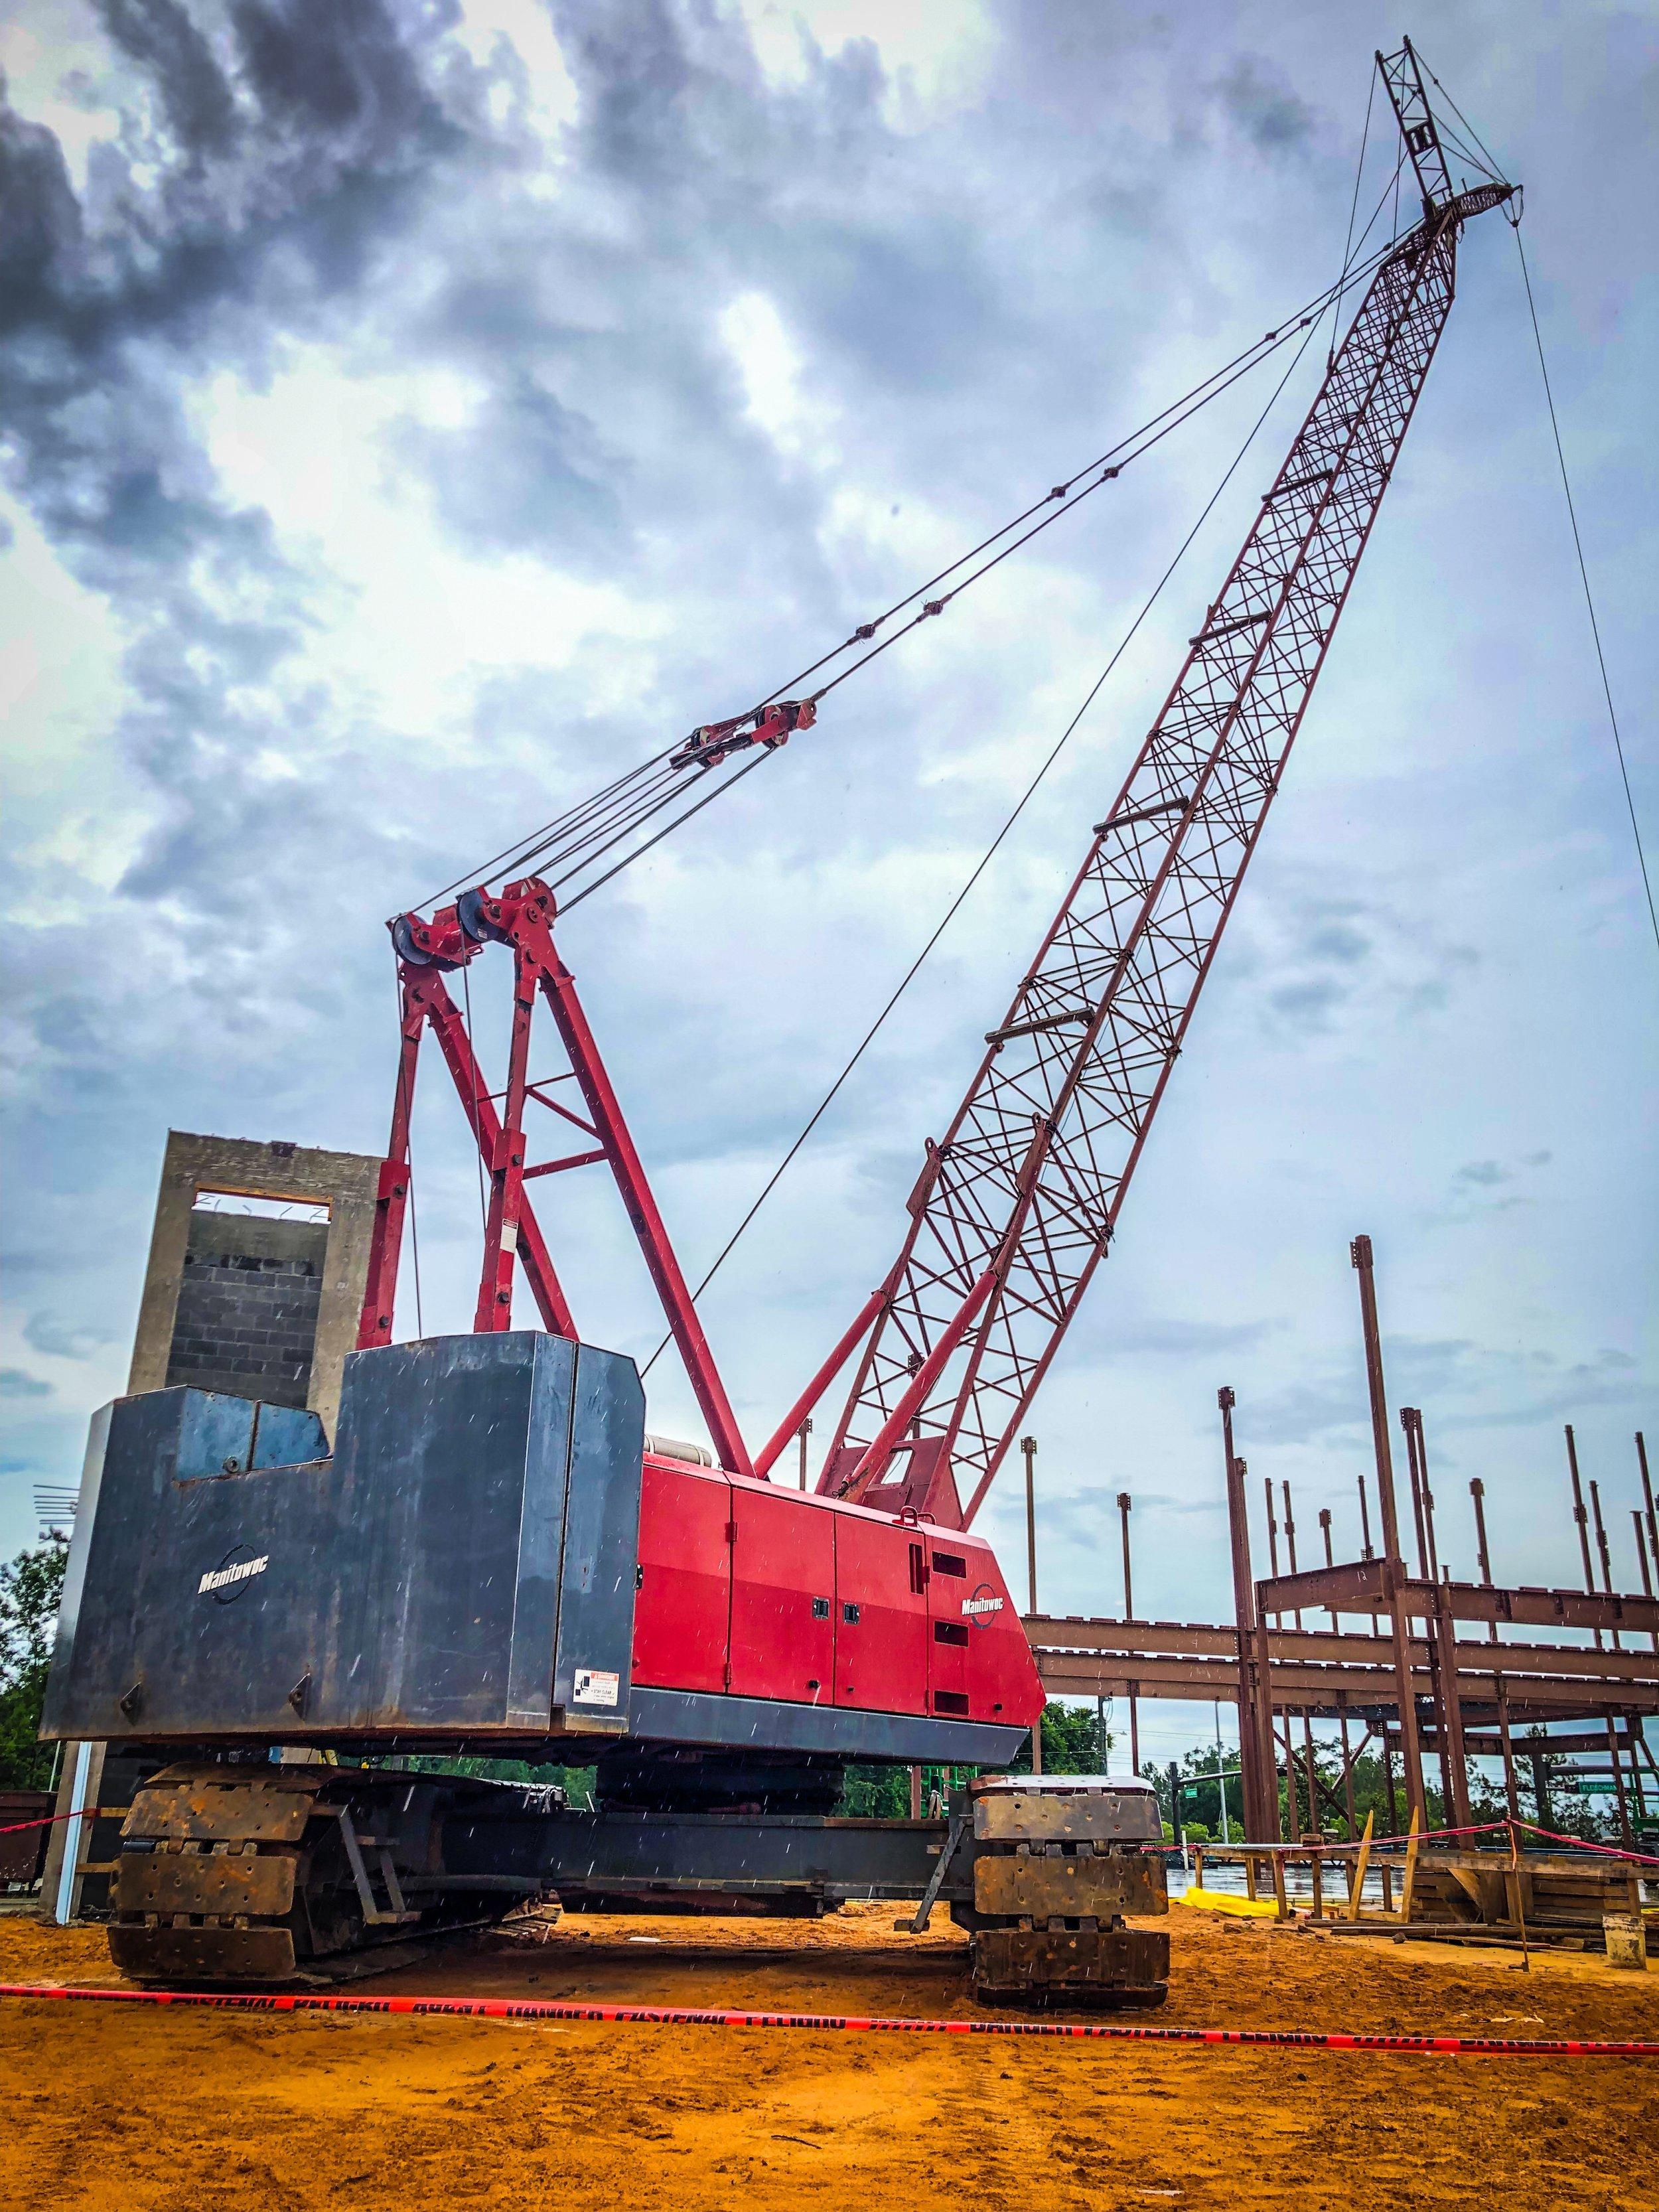 100 ton crawler crane on red beam hanging construction.JPEG